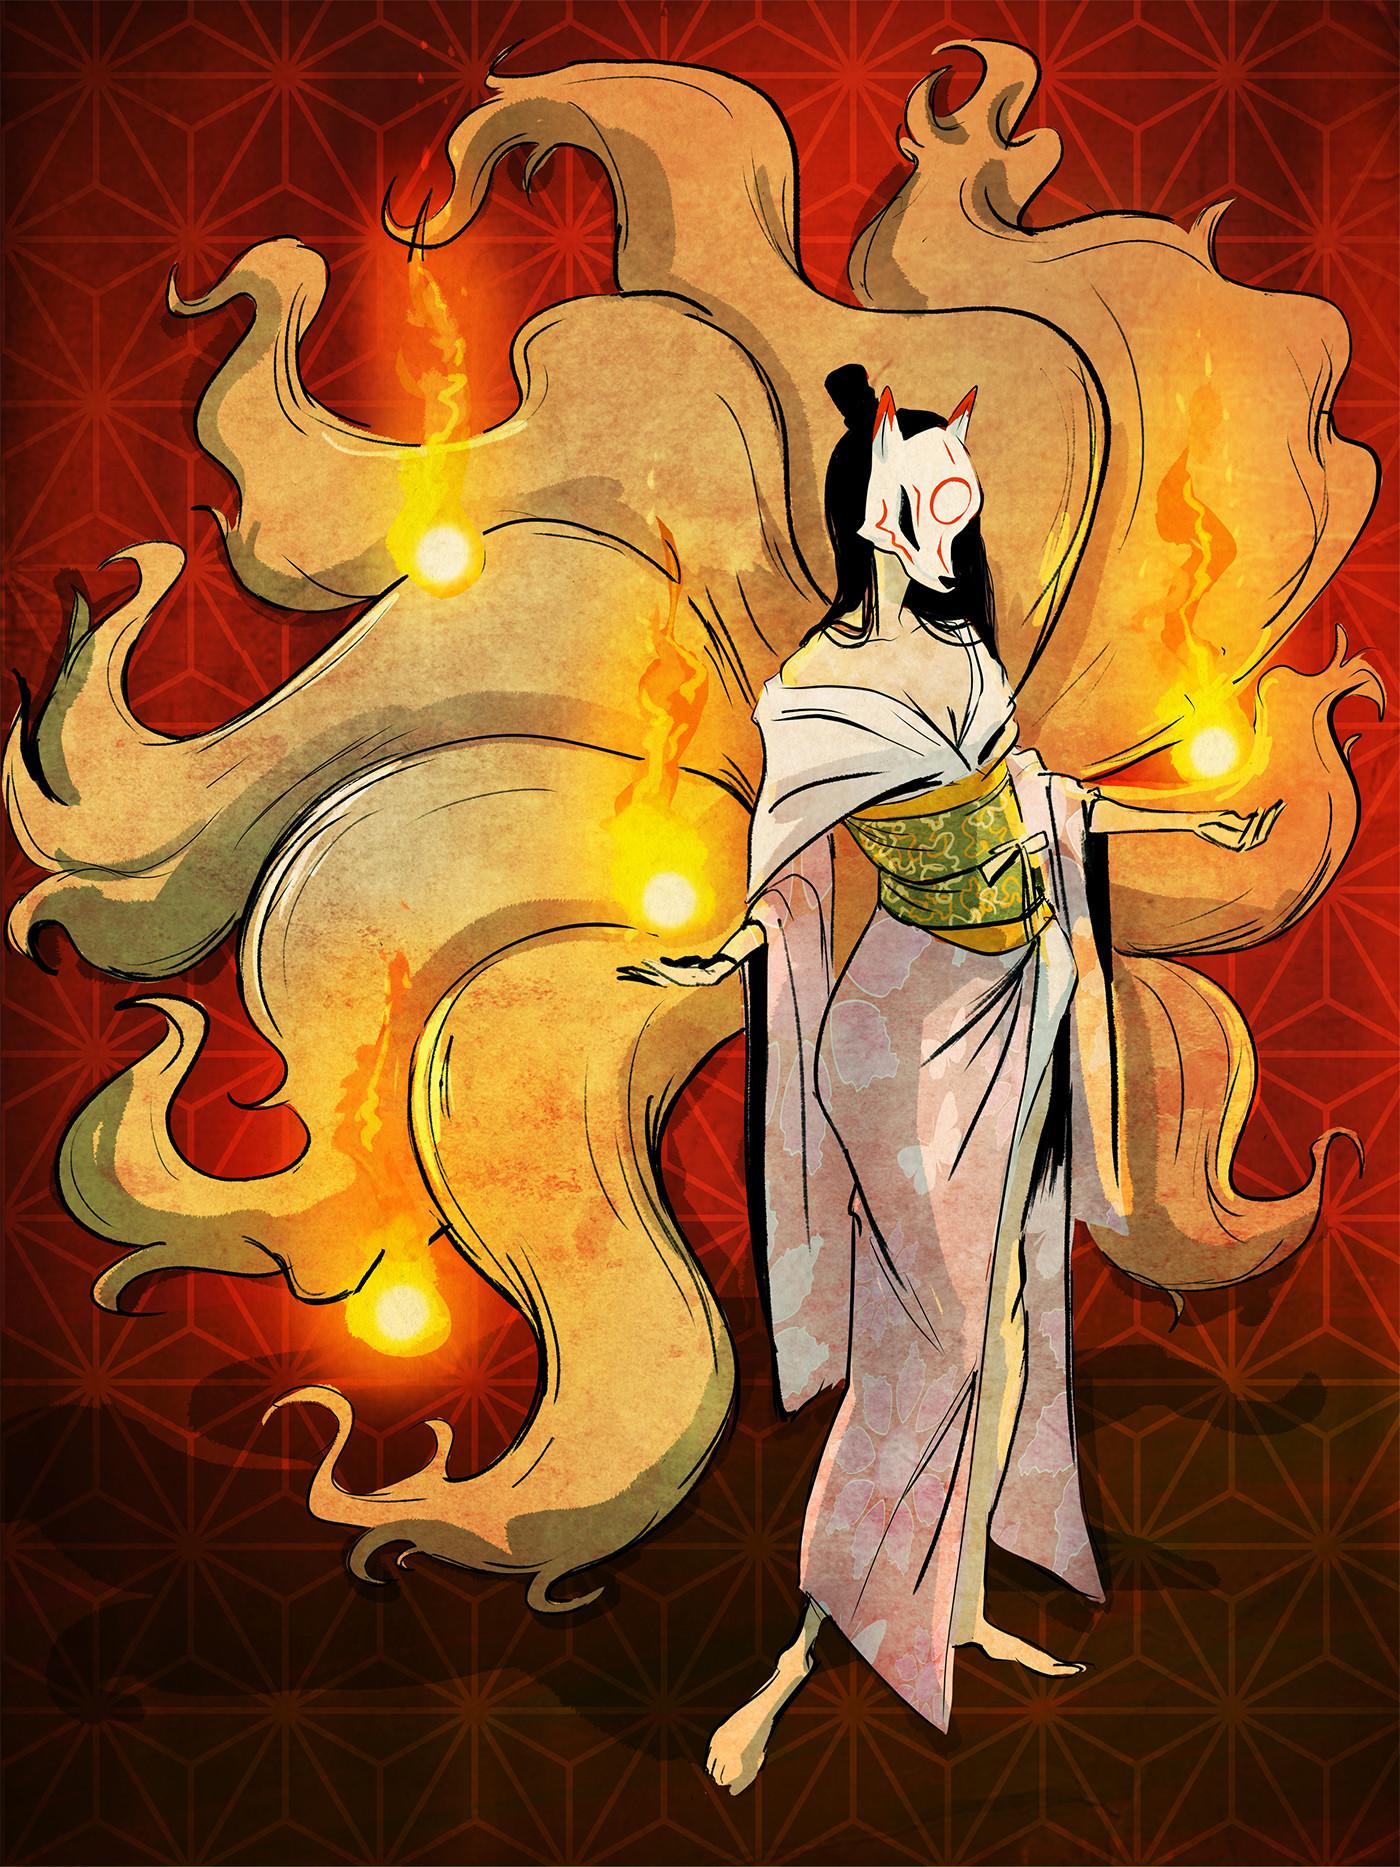 Lamaro smith jinja kitsune forest 0009 jinja kitsune fire